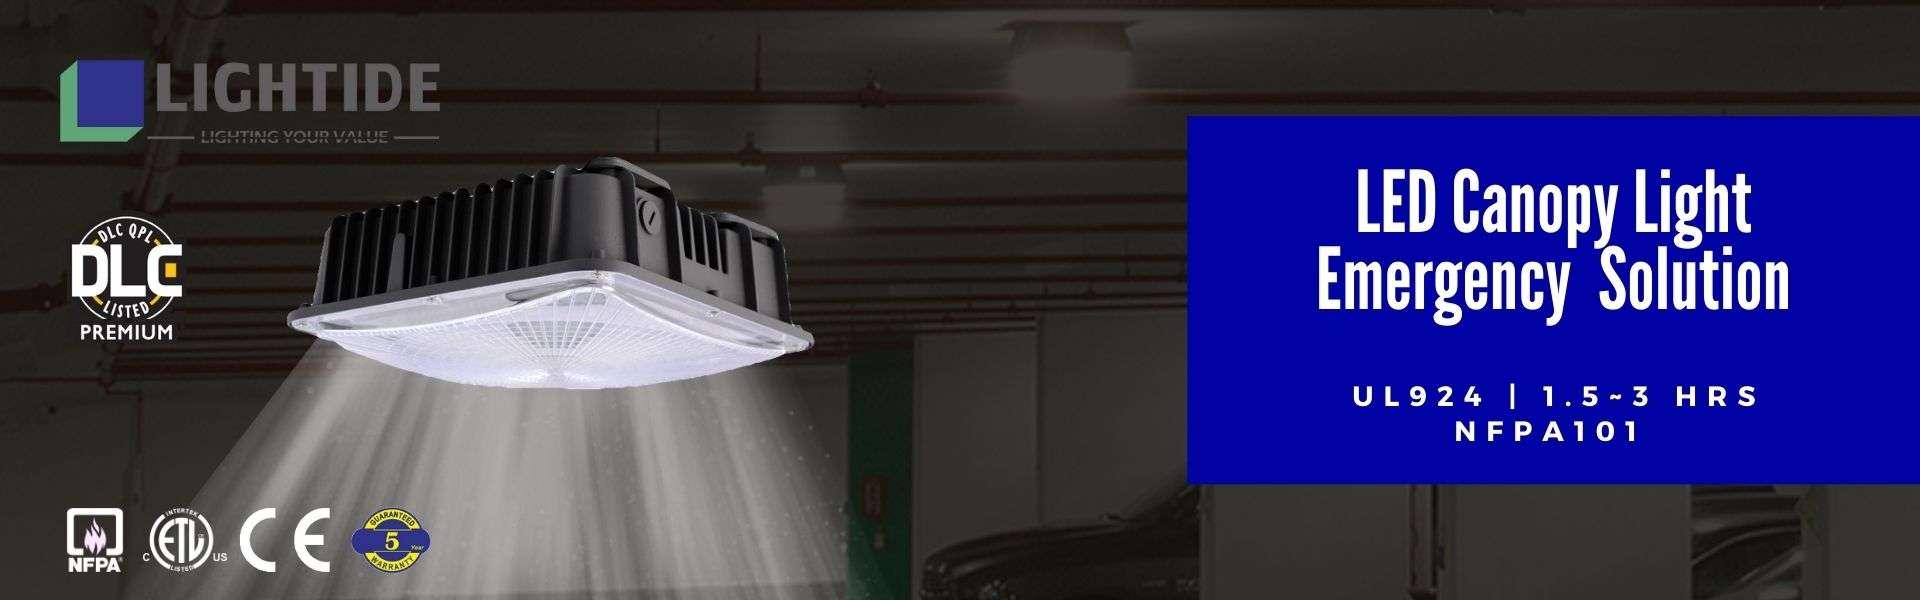 Lightide DLC premium & UL924 emergency LED garage canopy lights Battery Backup